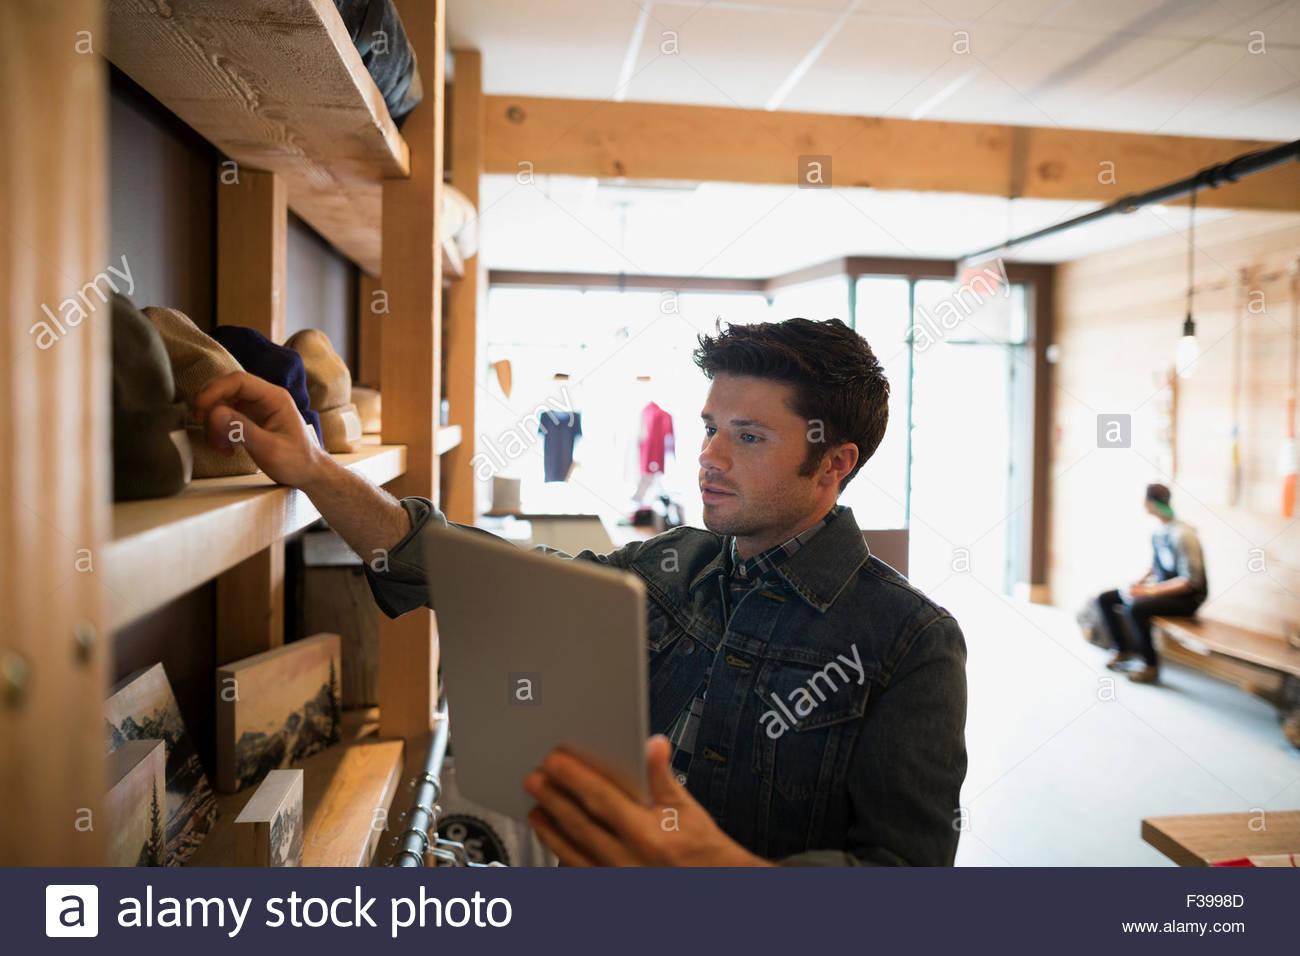 Arbeiter mit digital-Tablette im shop Stockbild